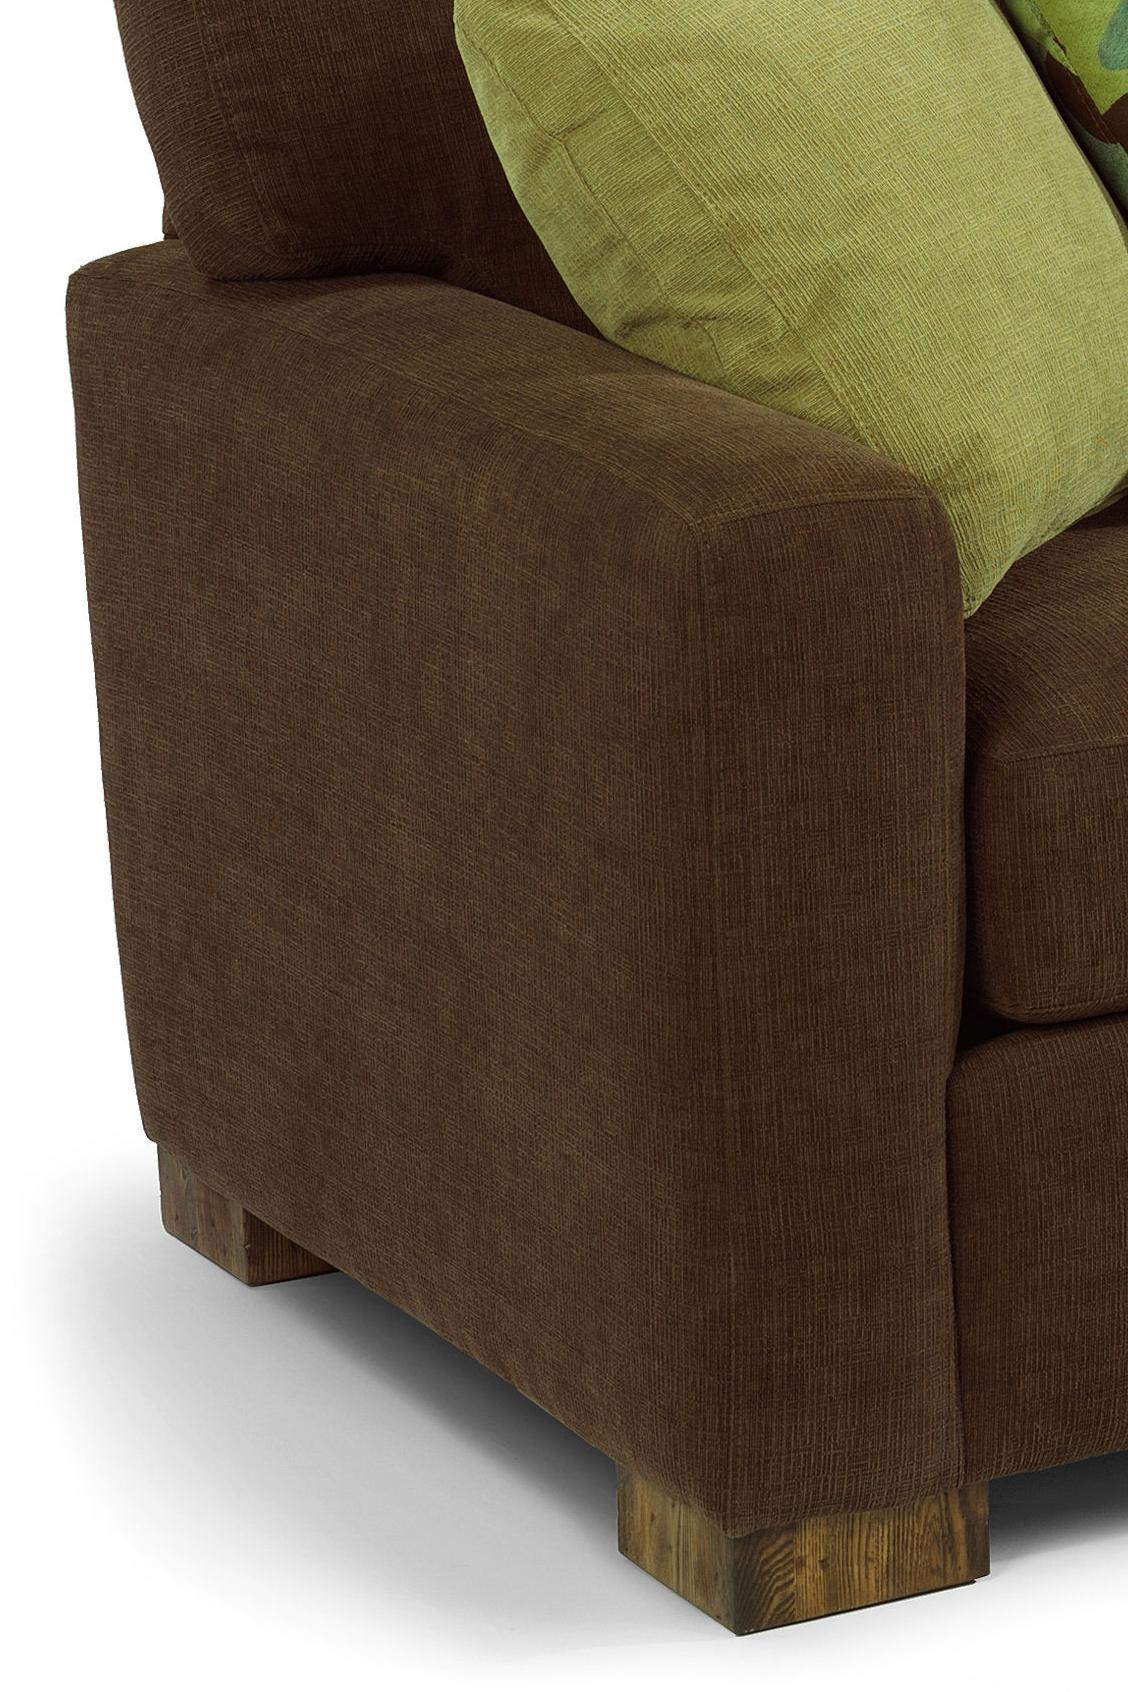 Bryant 7399 By Flexsteel Hudson S Furniture